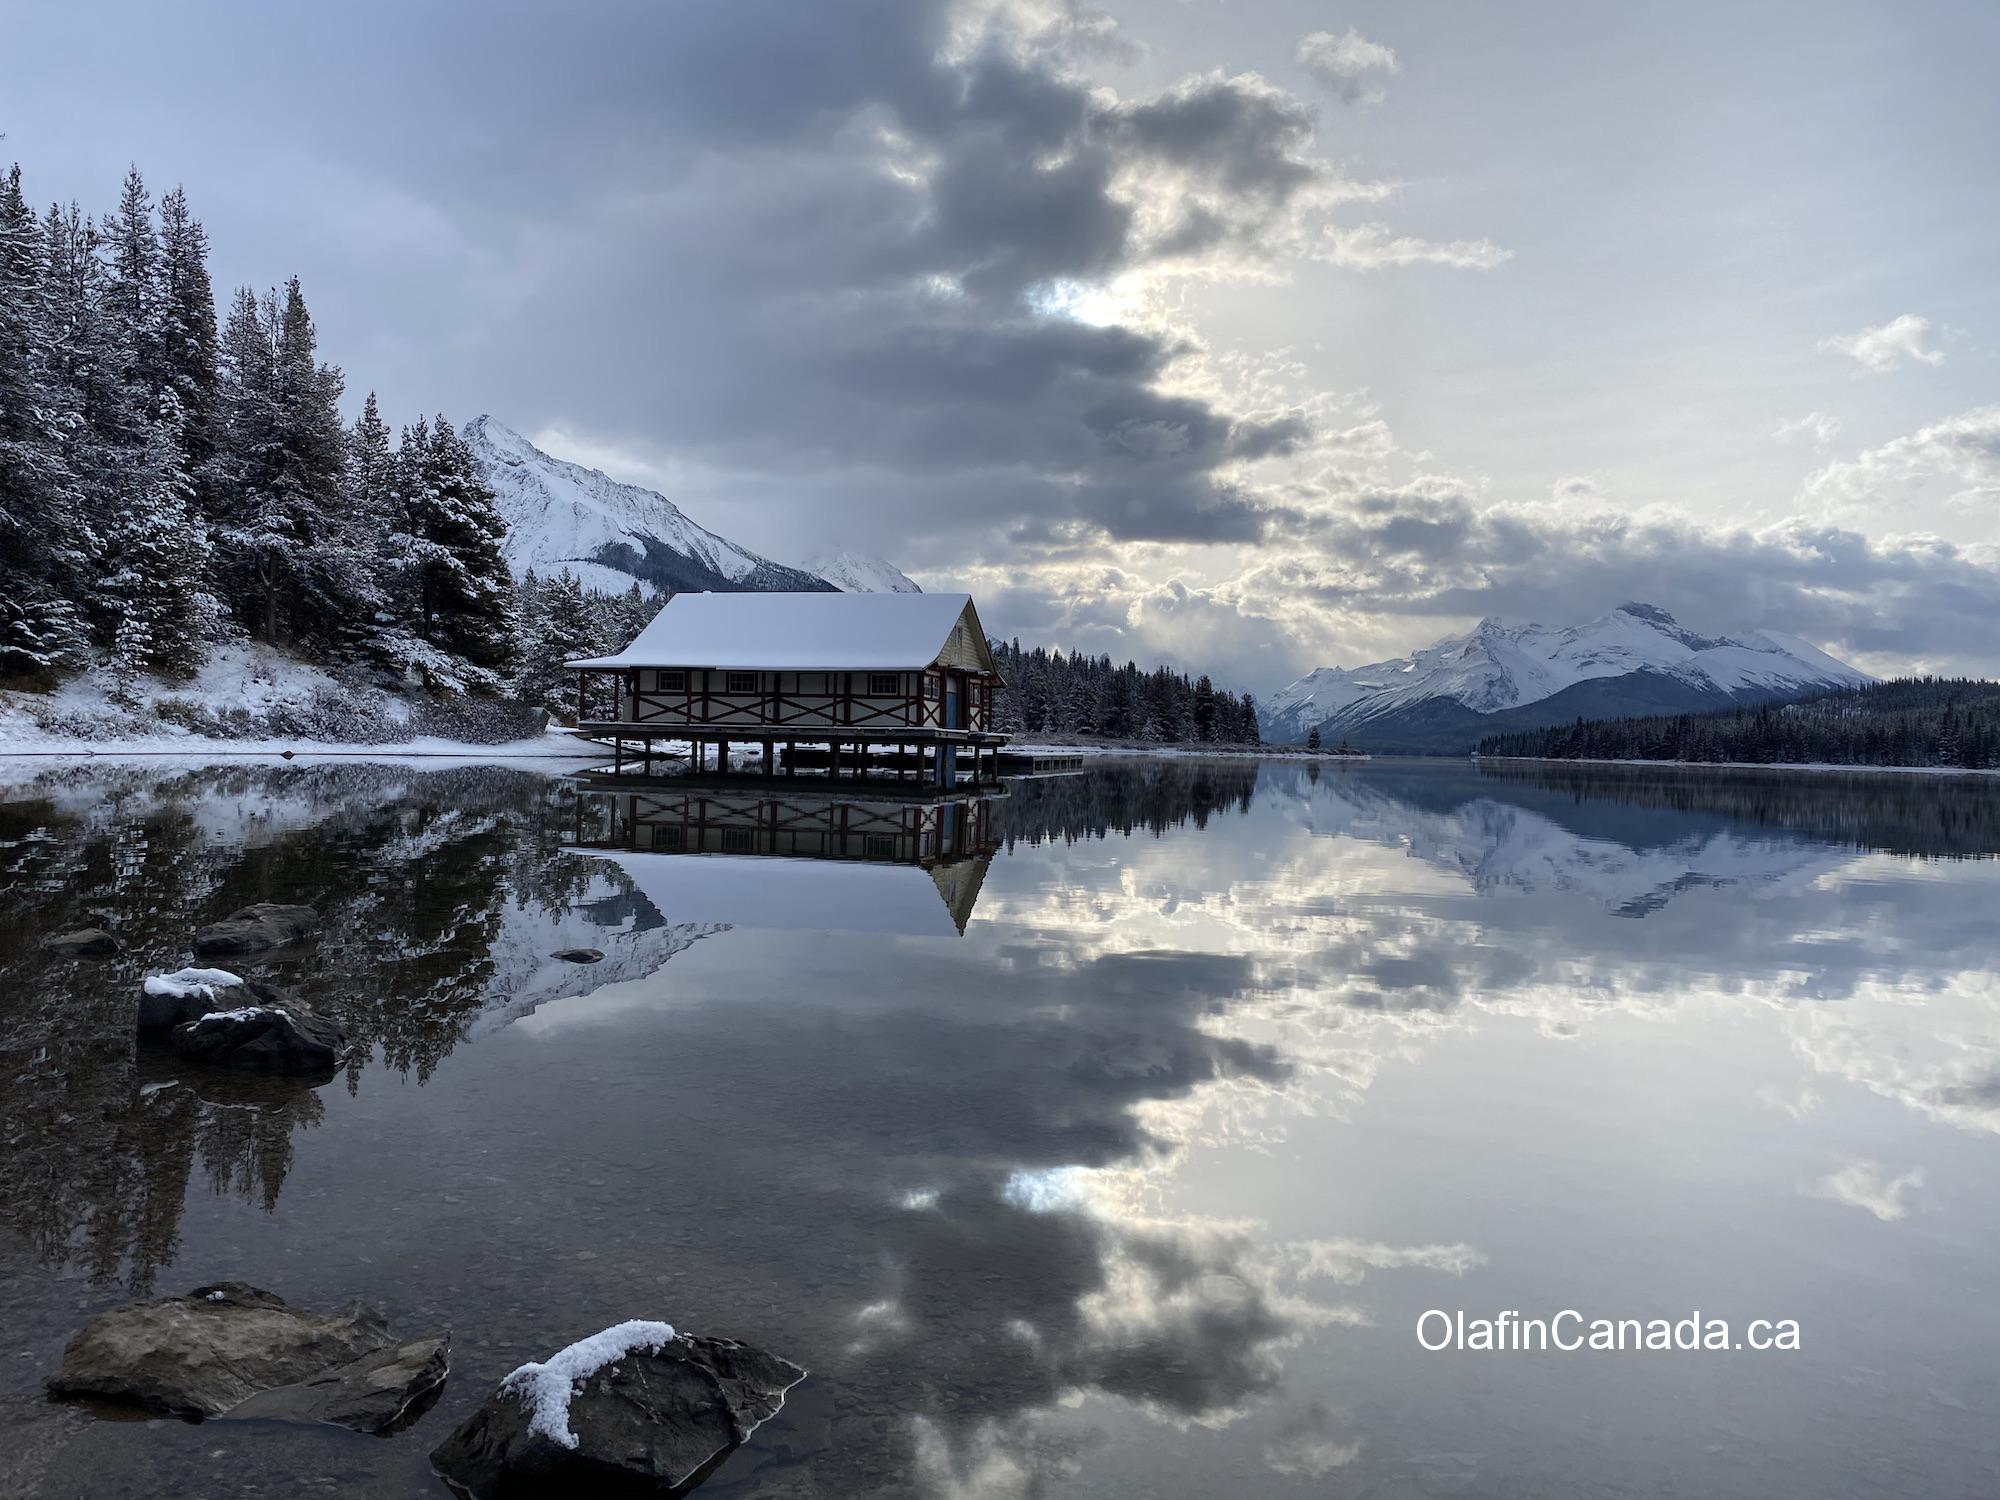 Maligne Lake boathouse in Jasper, AB #olafincanada #alberta #rockies #jasper #malignelake #boathouse